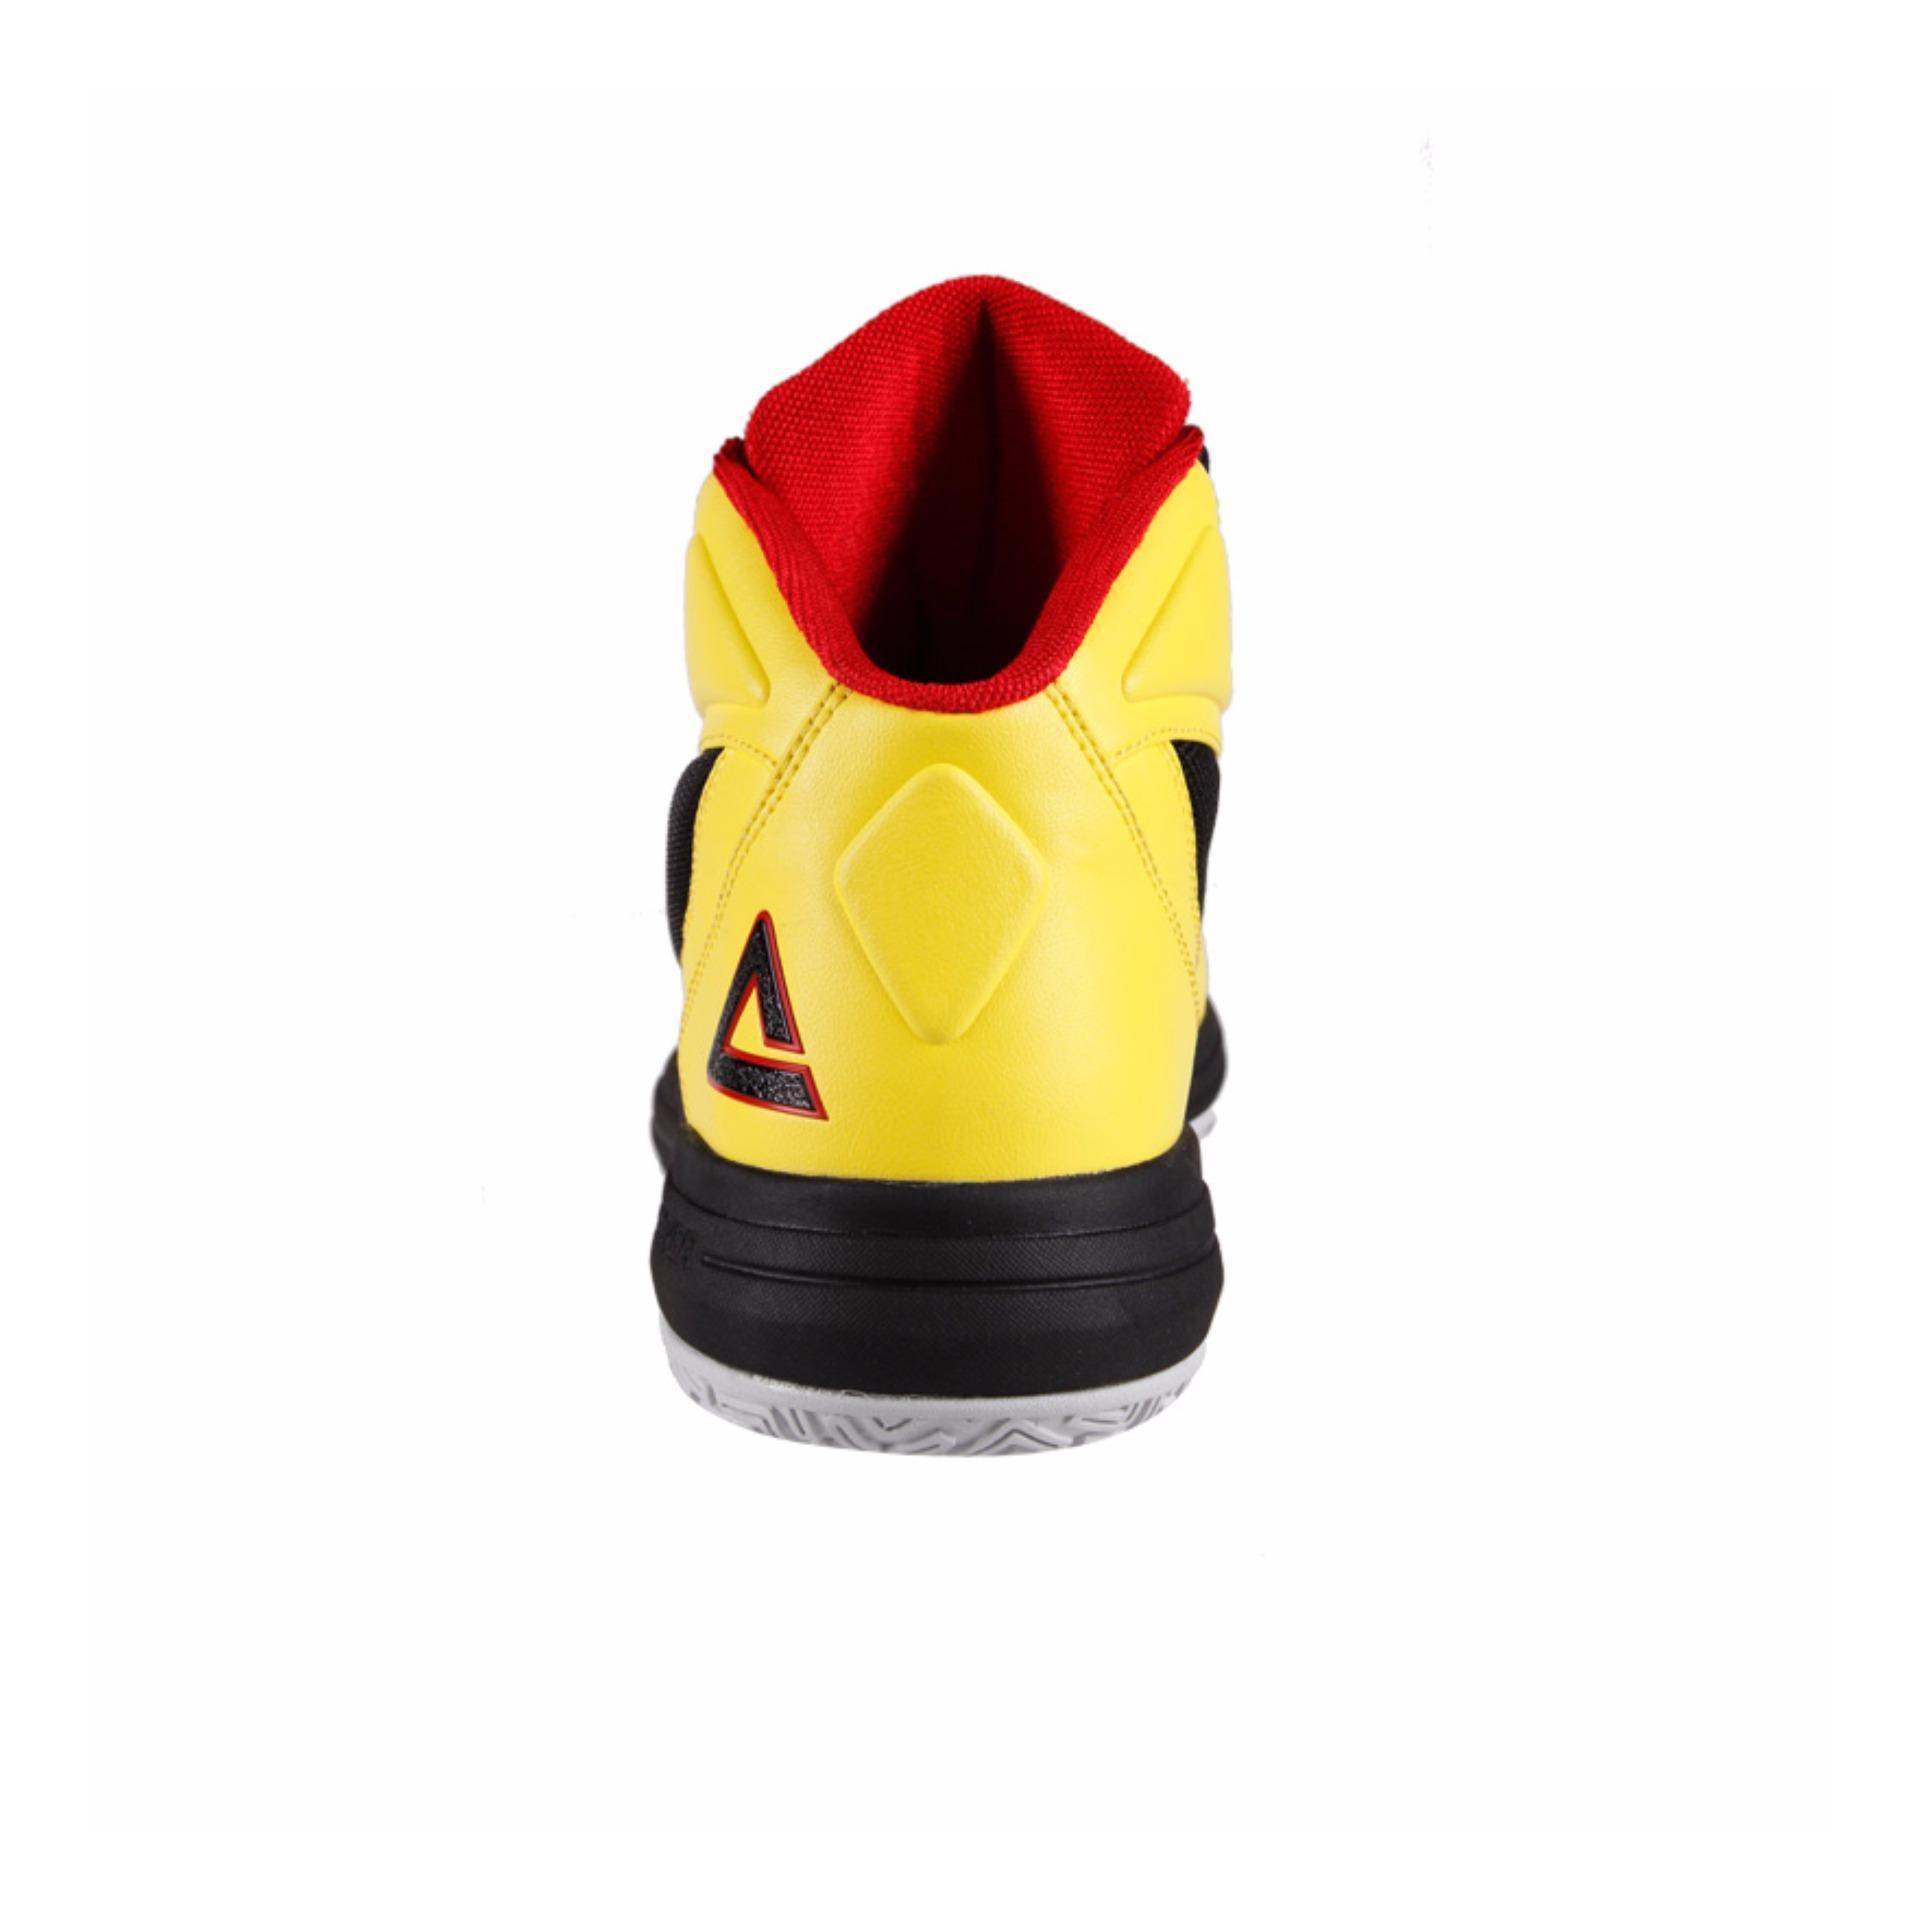 Sepatu Basket Peak E51301a George Hill Edition Hitam Daftar Harga Tony Parker9 Ii E44323a Blue Red E44321a Cobra Yellow Original